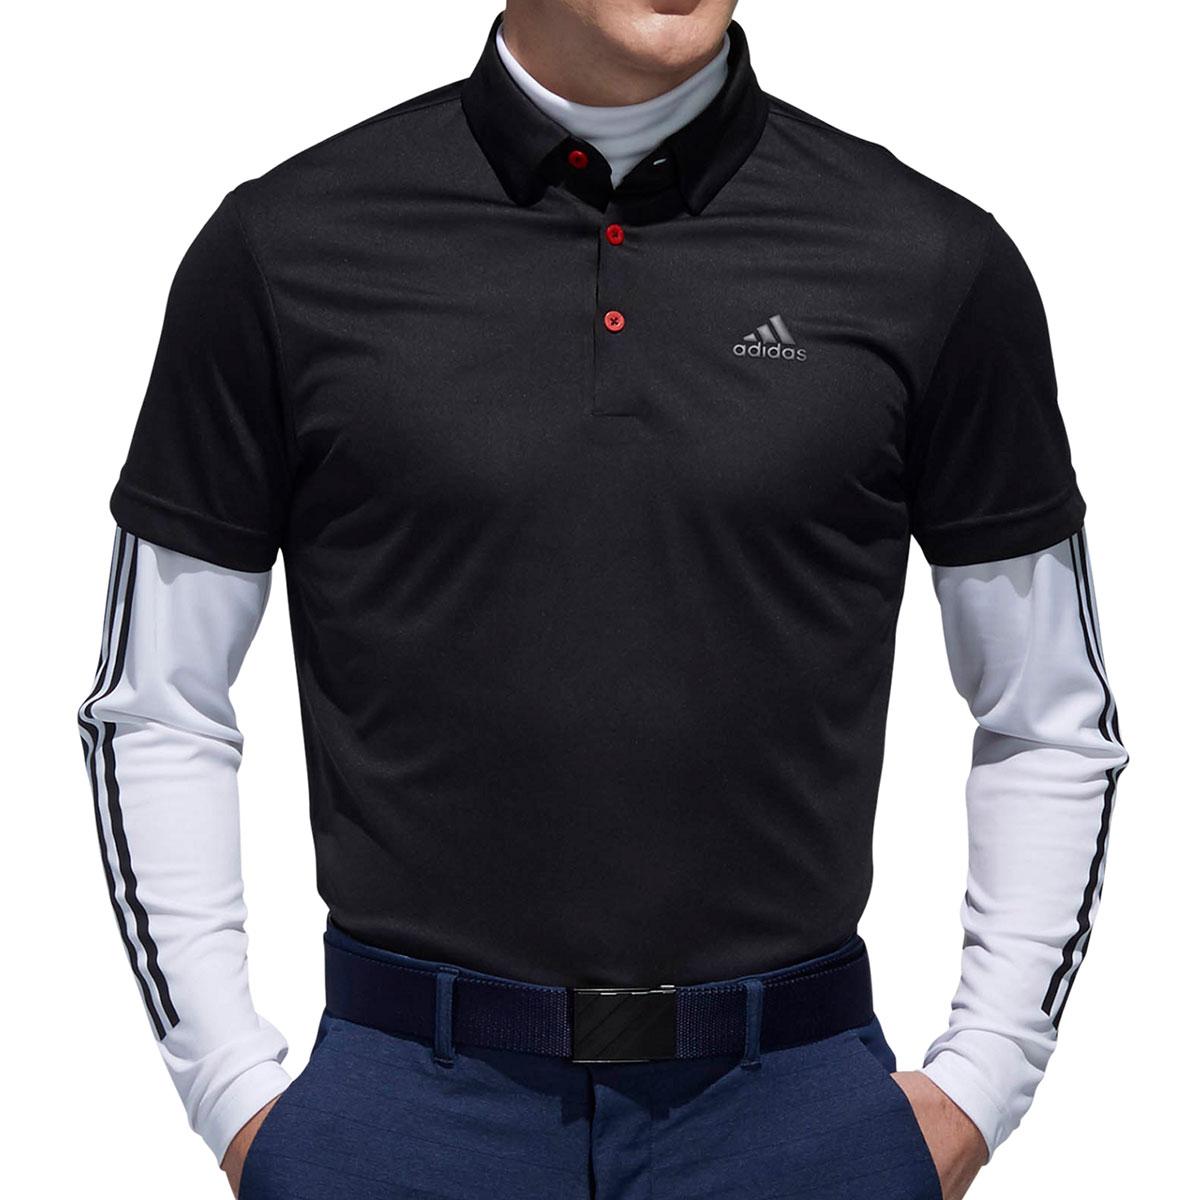 PF スリーストライプス レイヤード半袖ボタンダウンポロシャツ